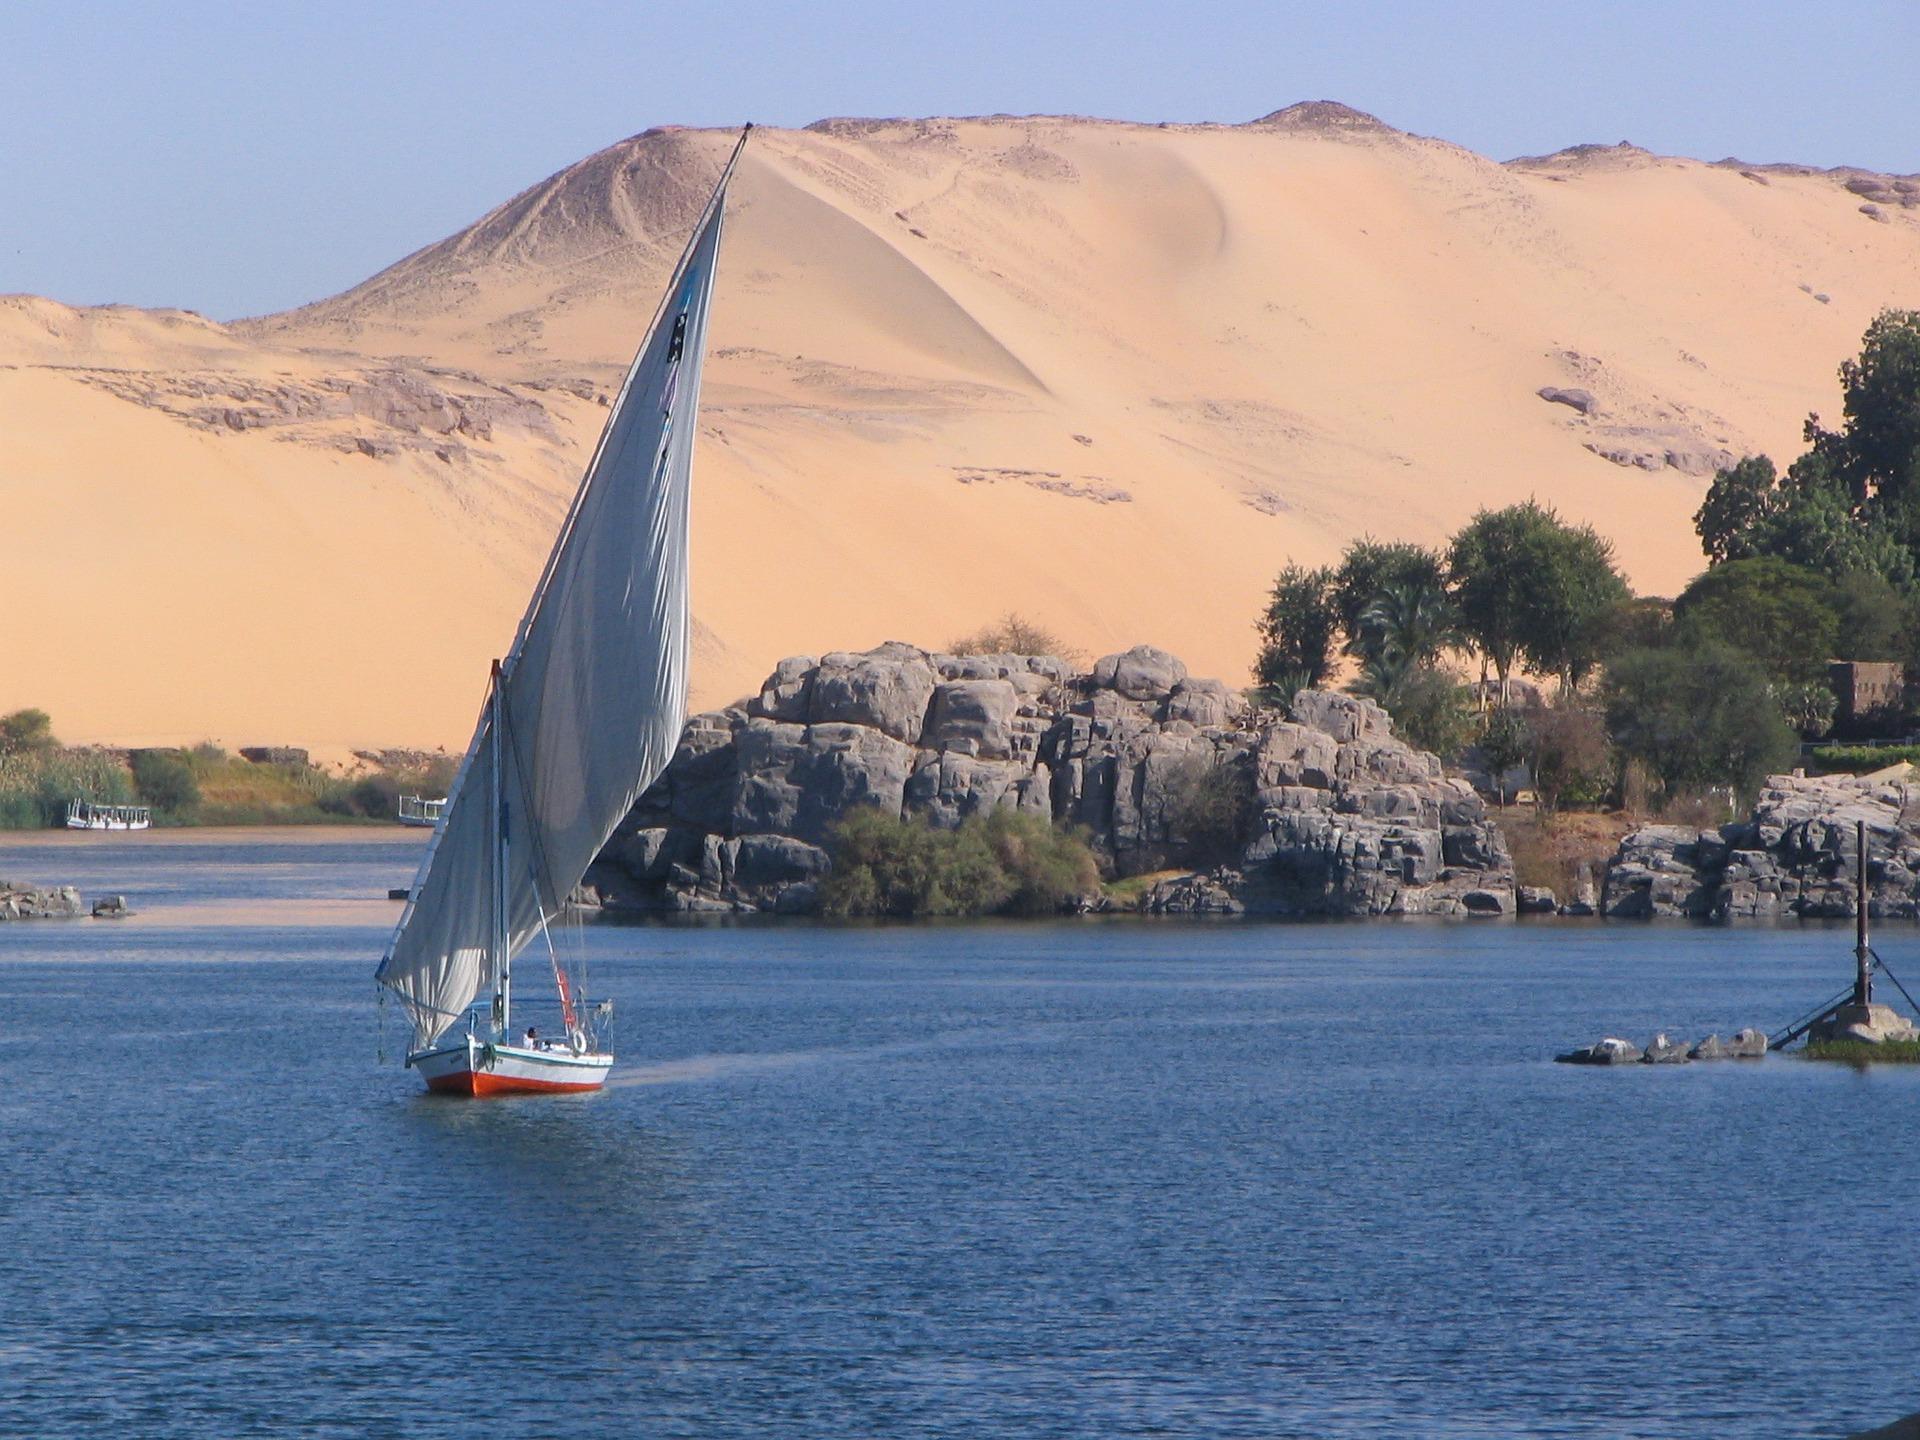 Elephantine, island in the Nile, Egypt